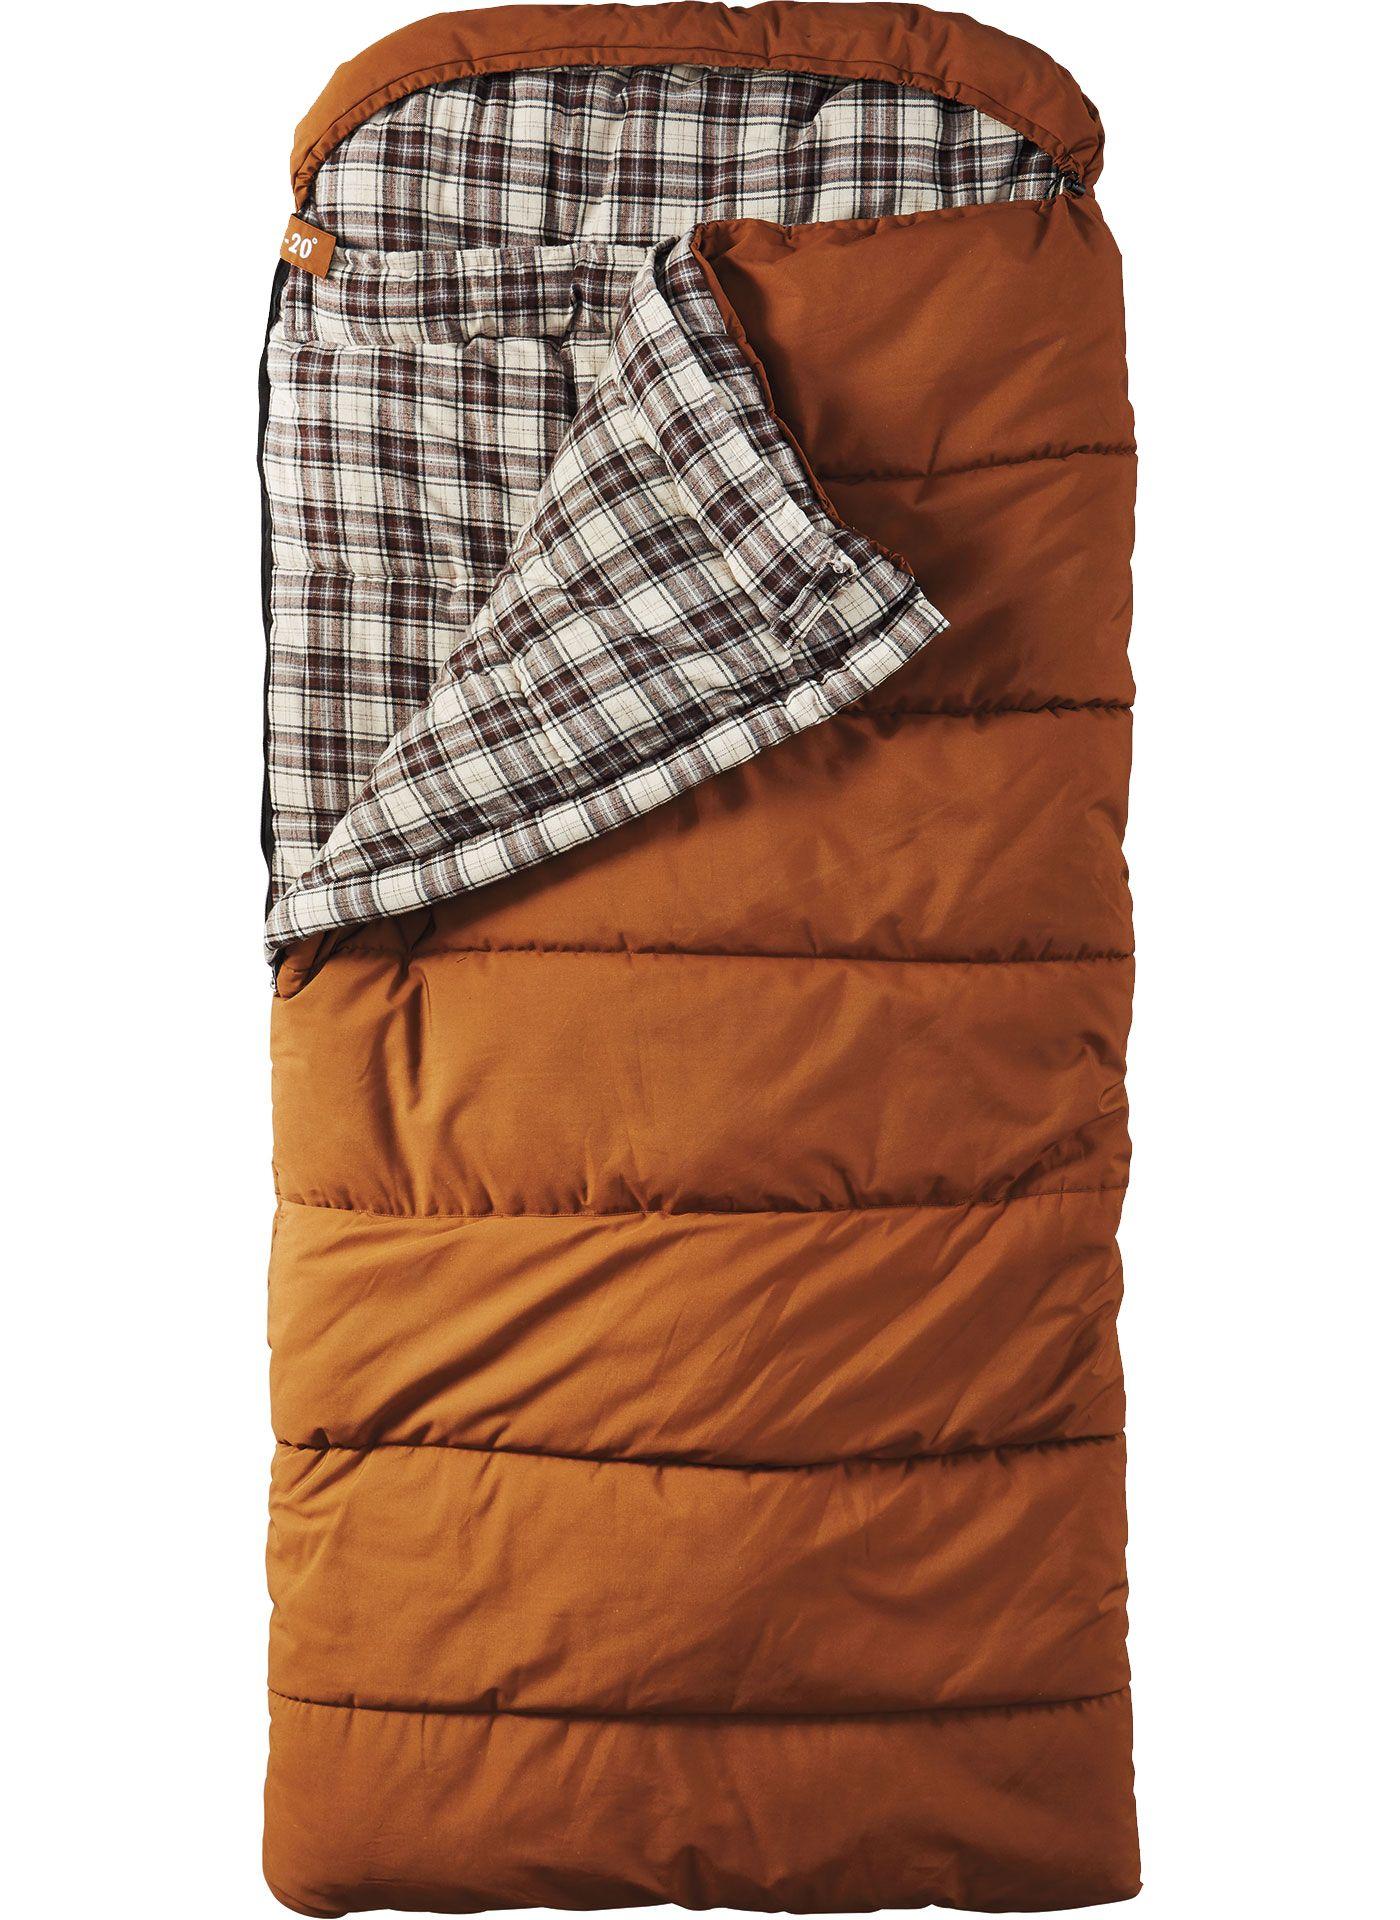 Field & Stream Fairbanks -20° Sleeping Bag